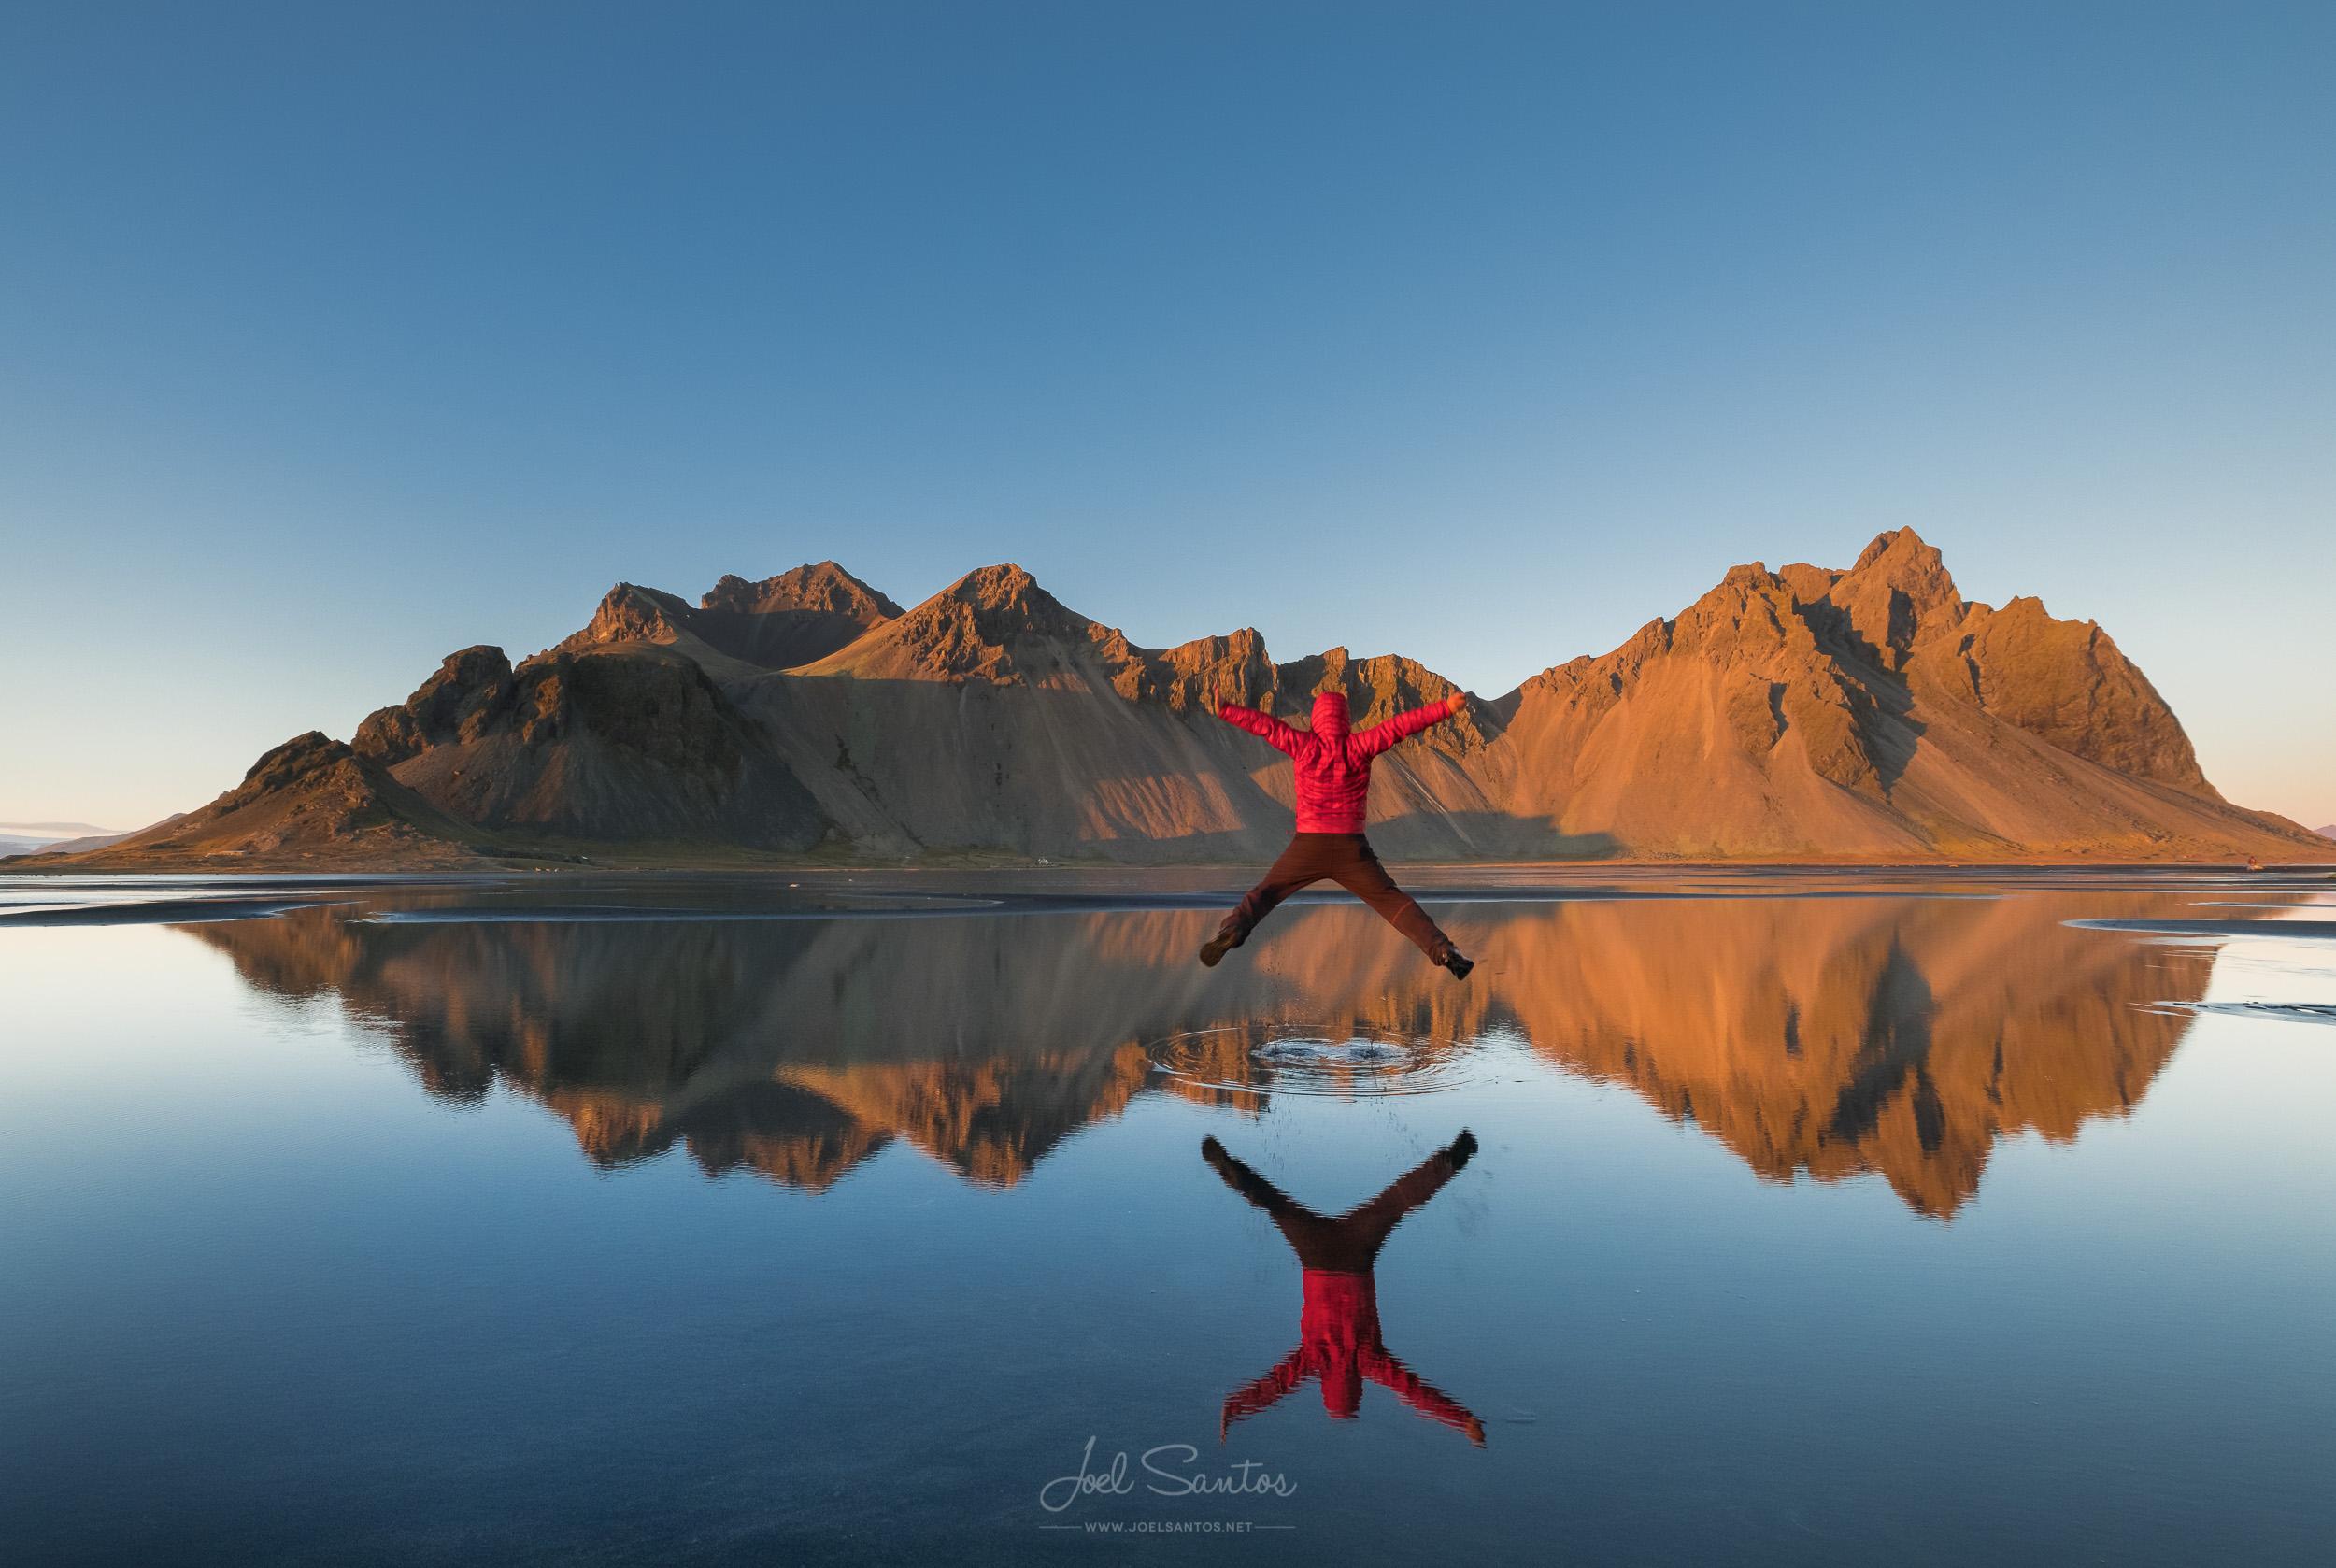 """X"", Man jumping, Stokksnes peninsula, Iceland"